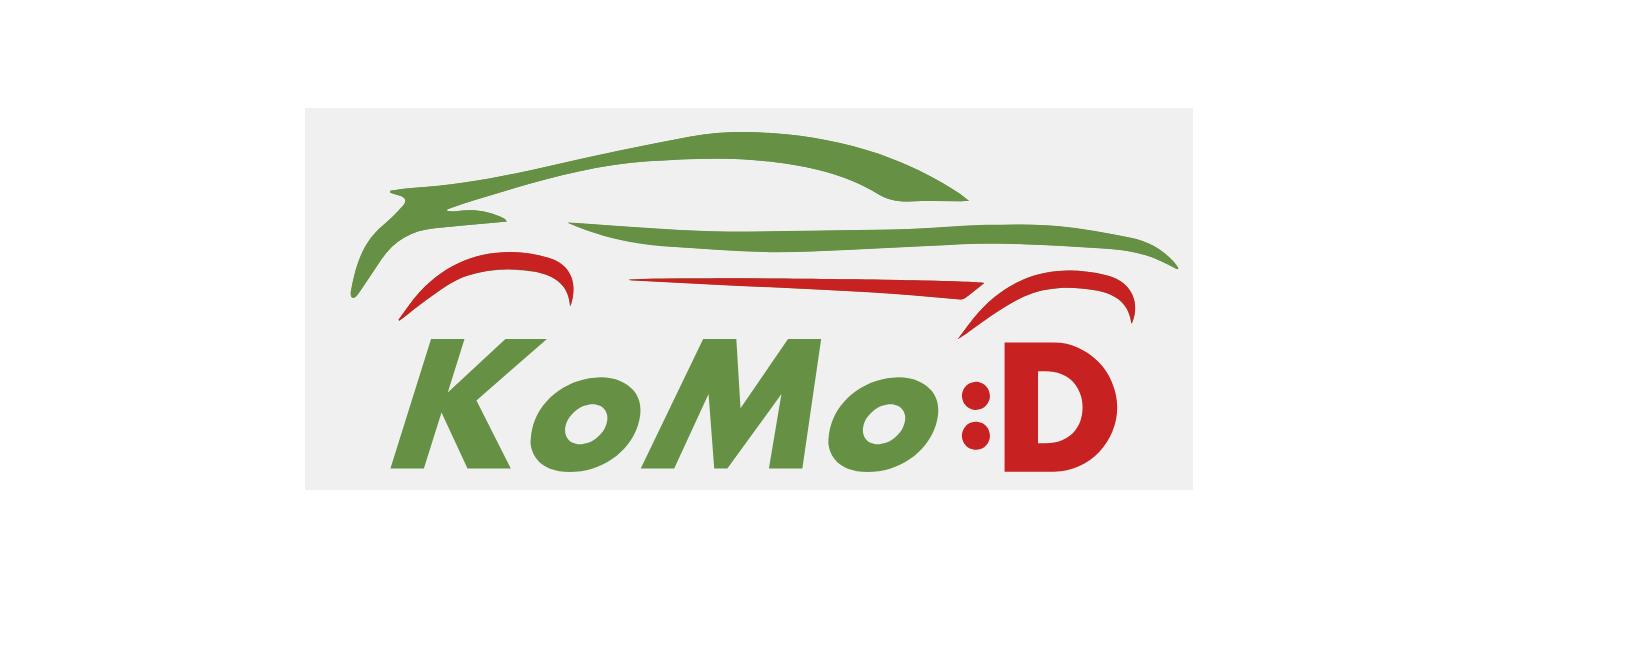 logo KoMoD